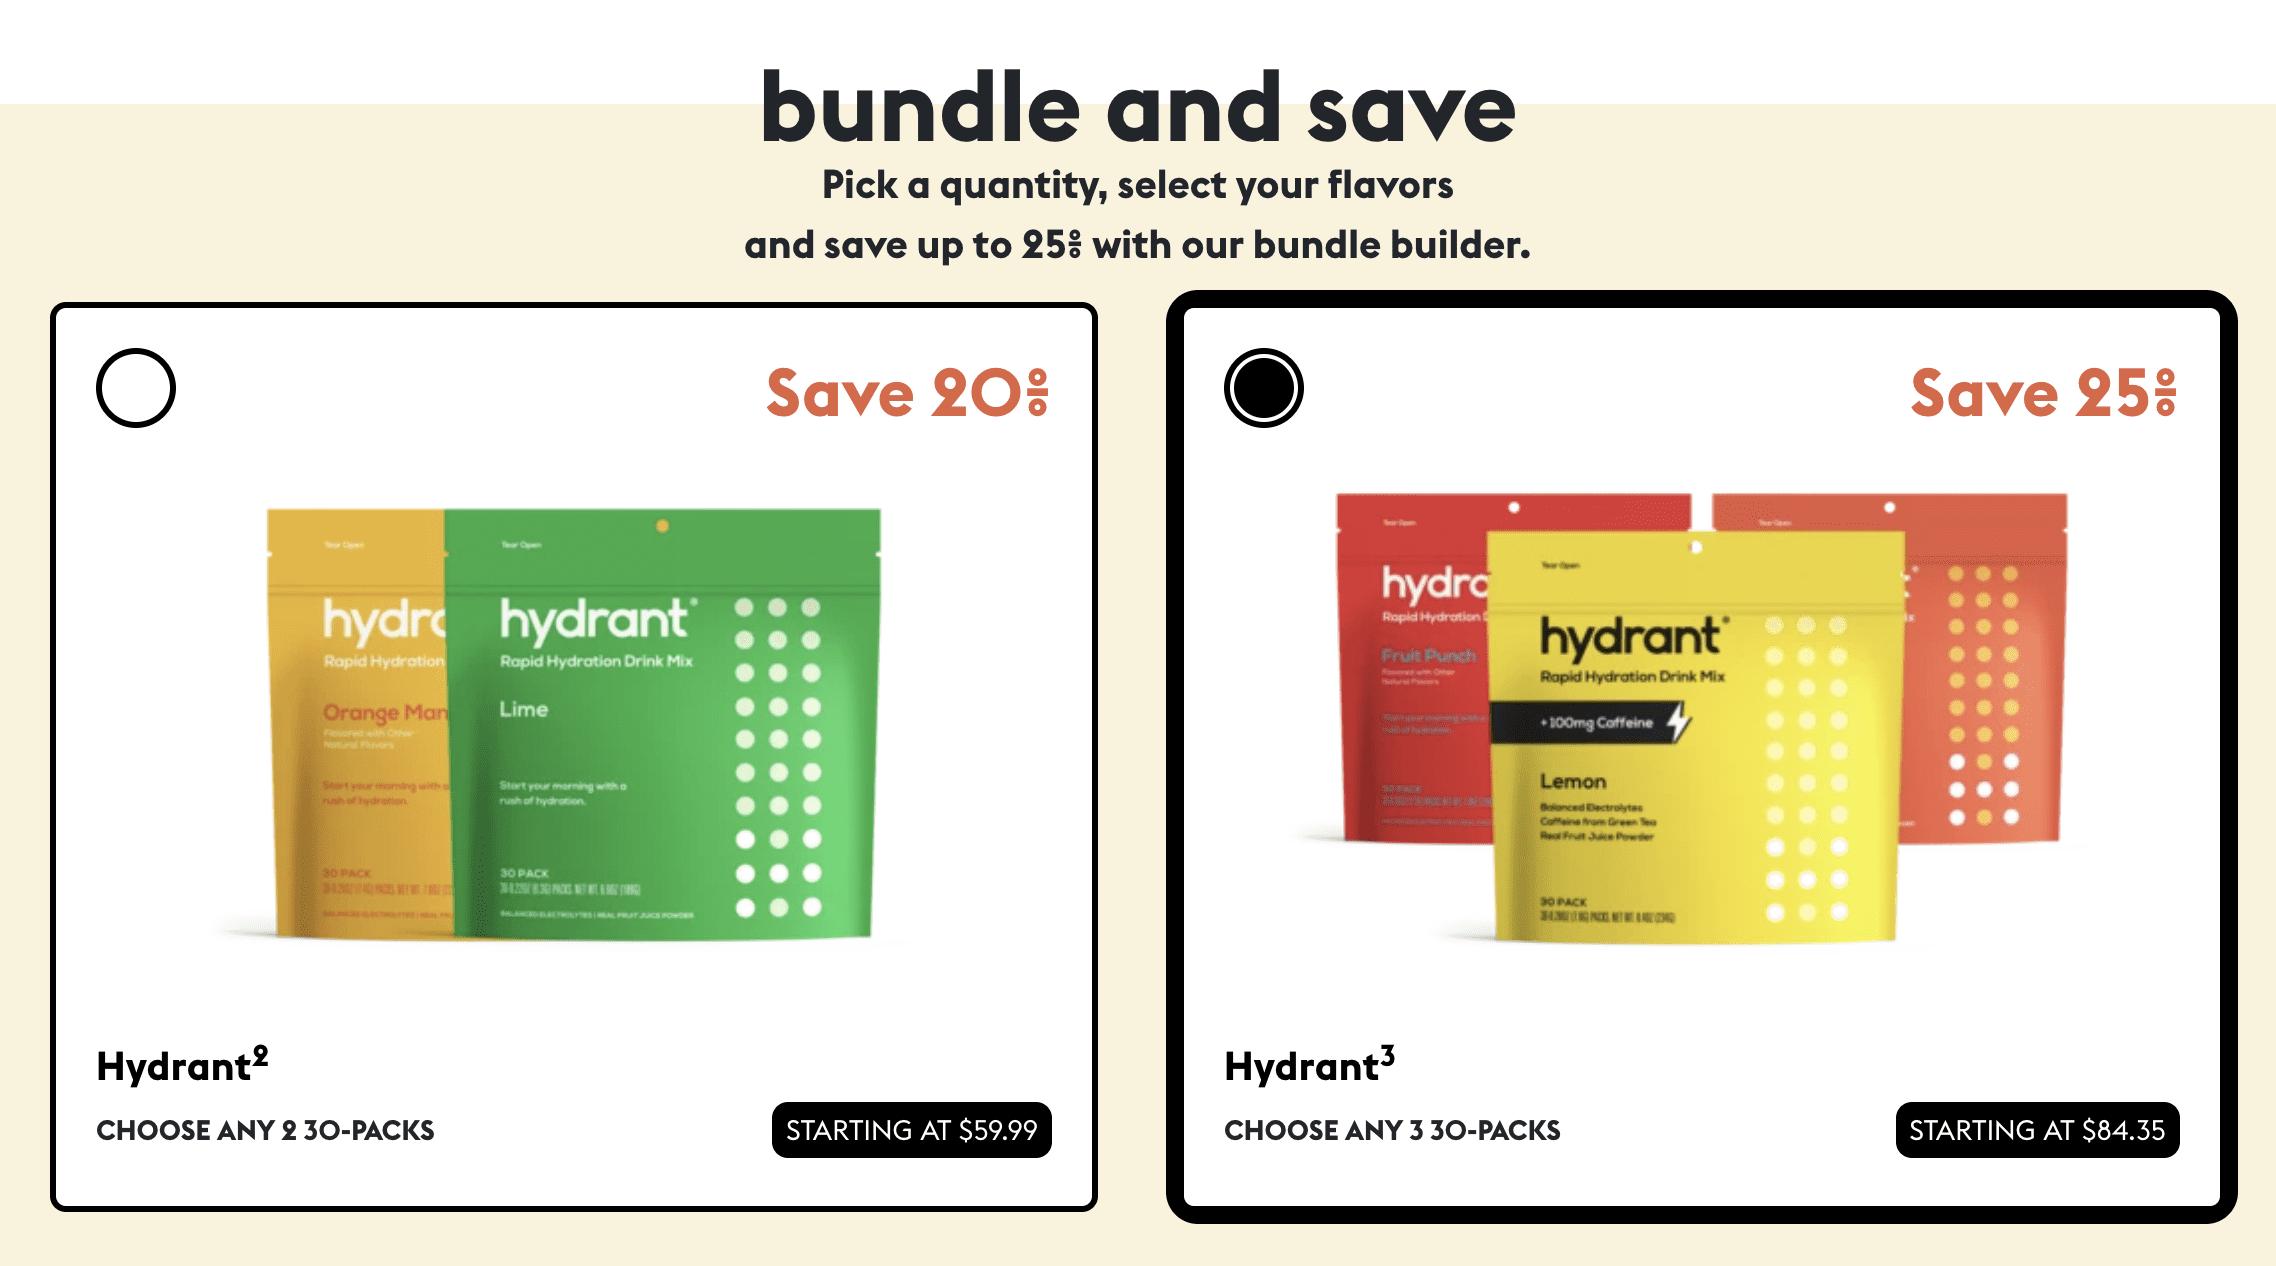 Hydrant subscription bundles